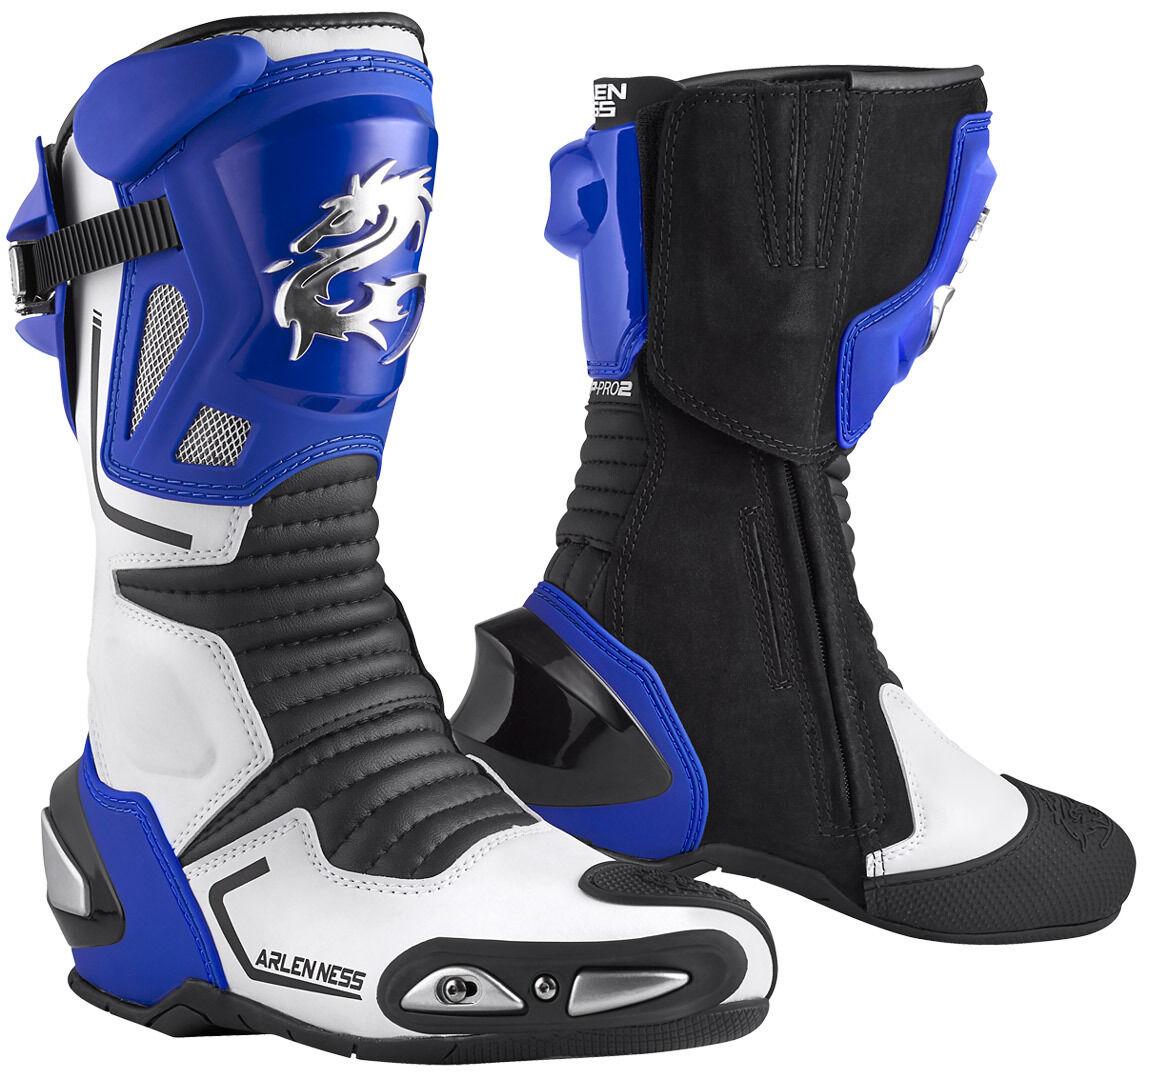 Arlen Ness Sugello Bottes de moto Noir Blanc Bleu taille : 38